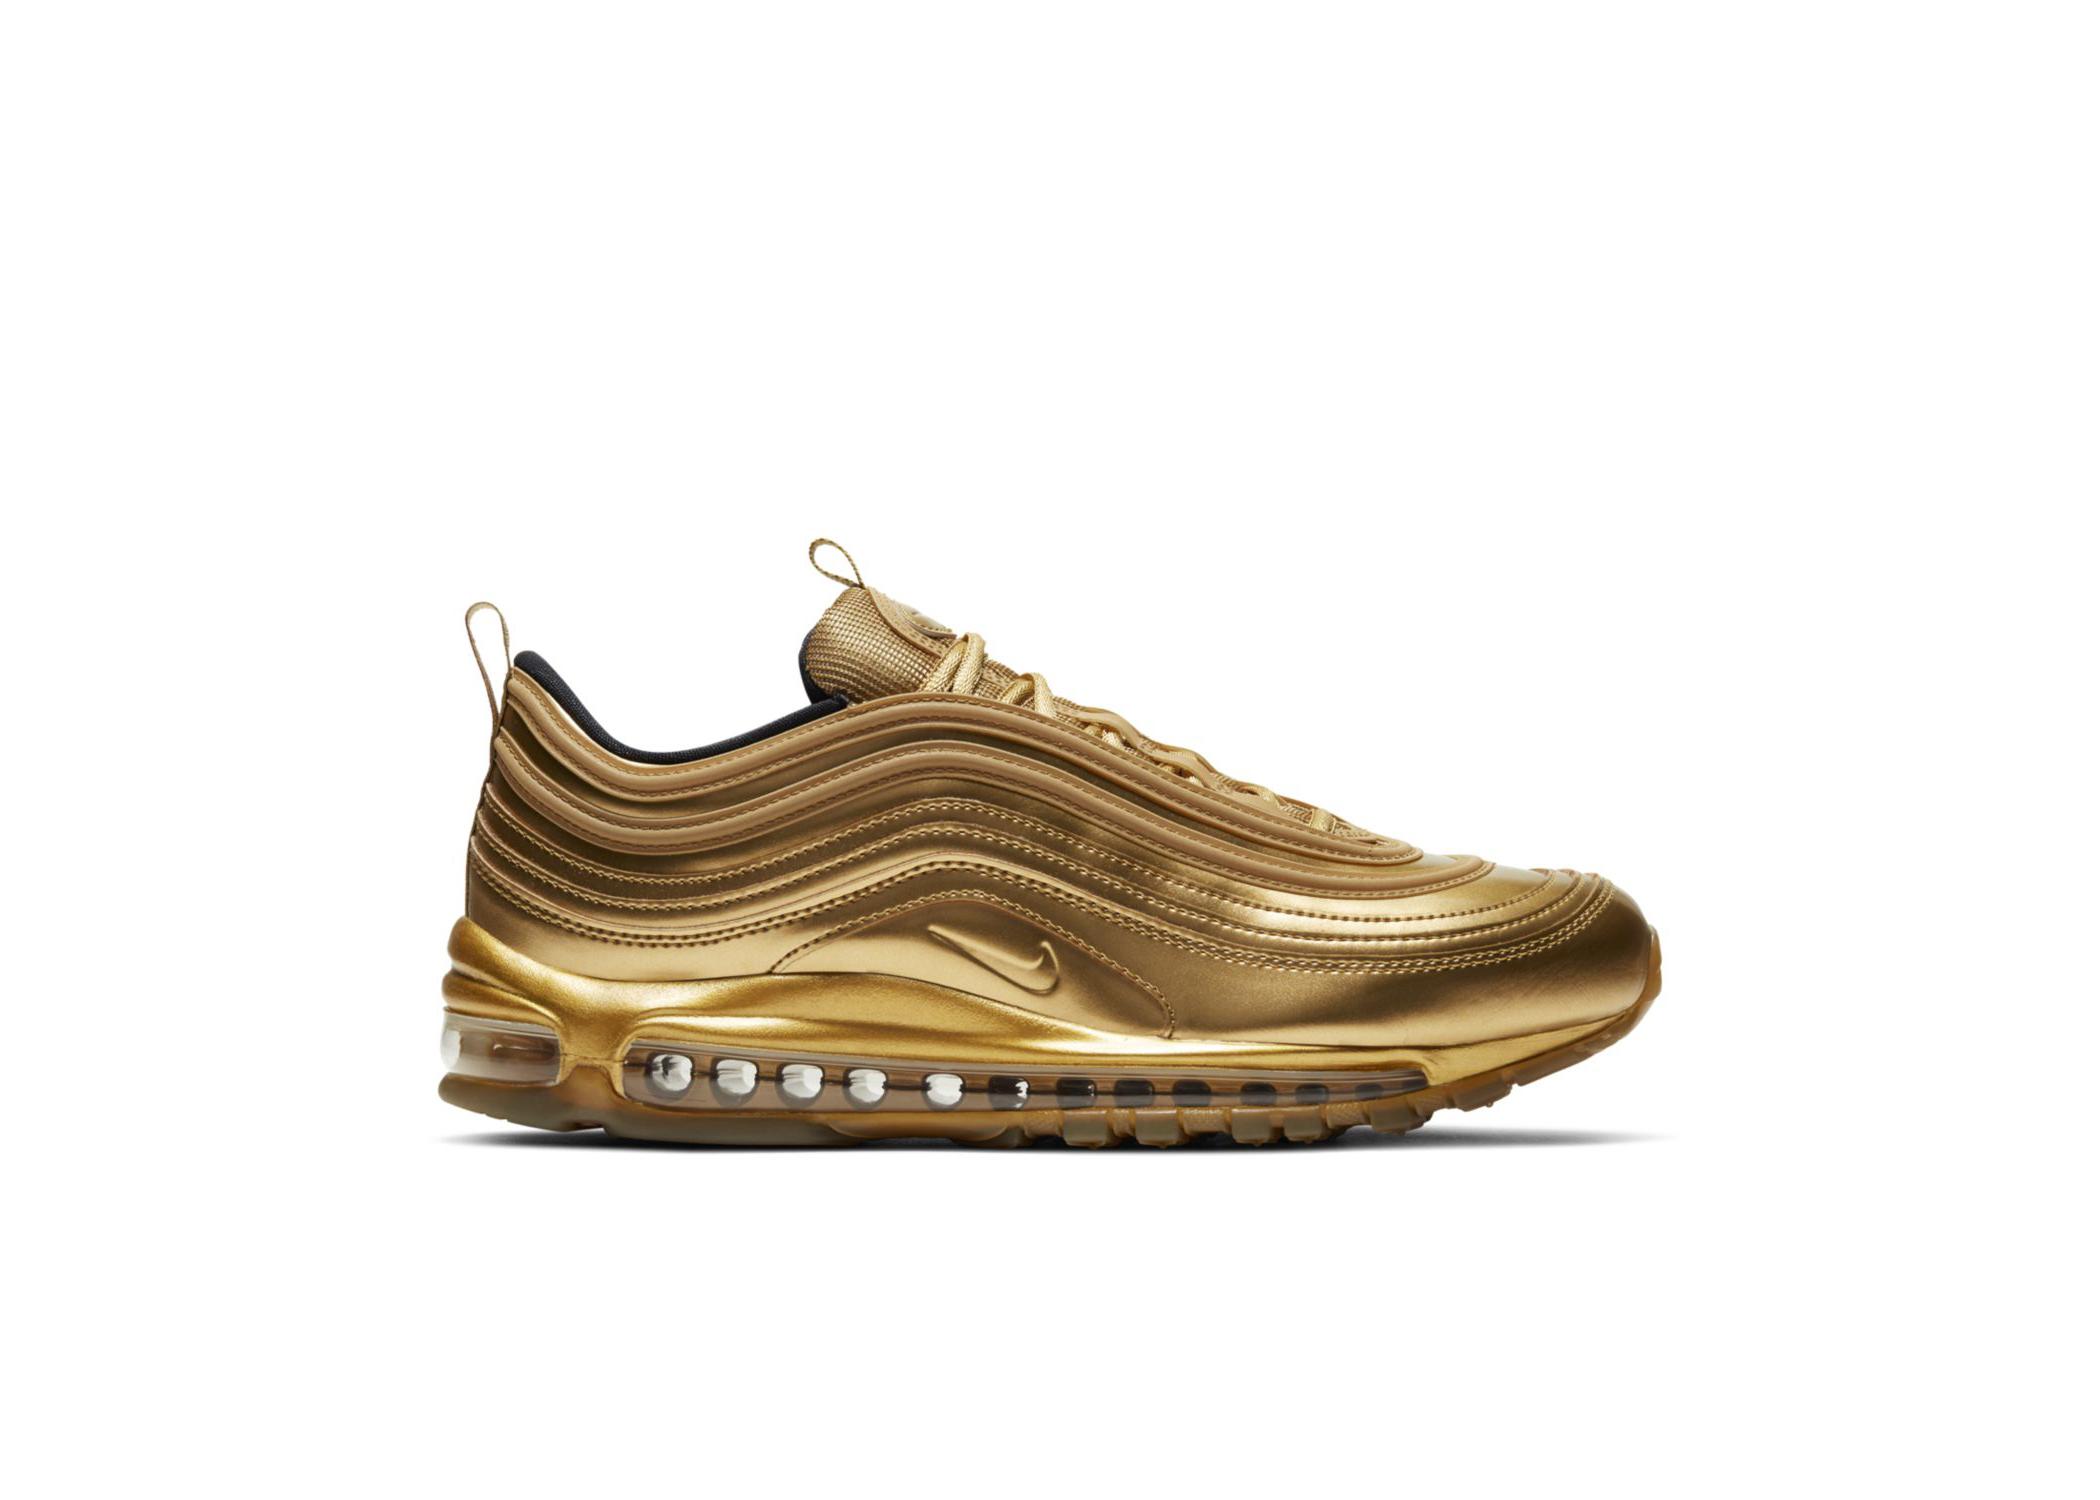 Nike Air Max 97 Metallic Gold - CT4556-700